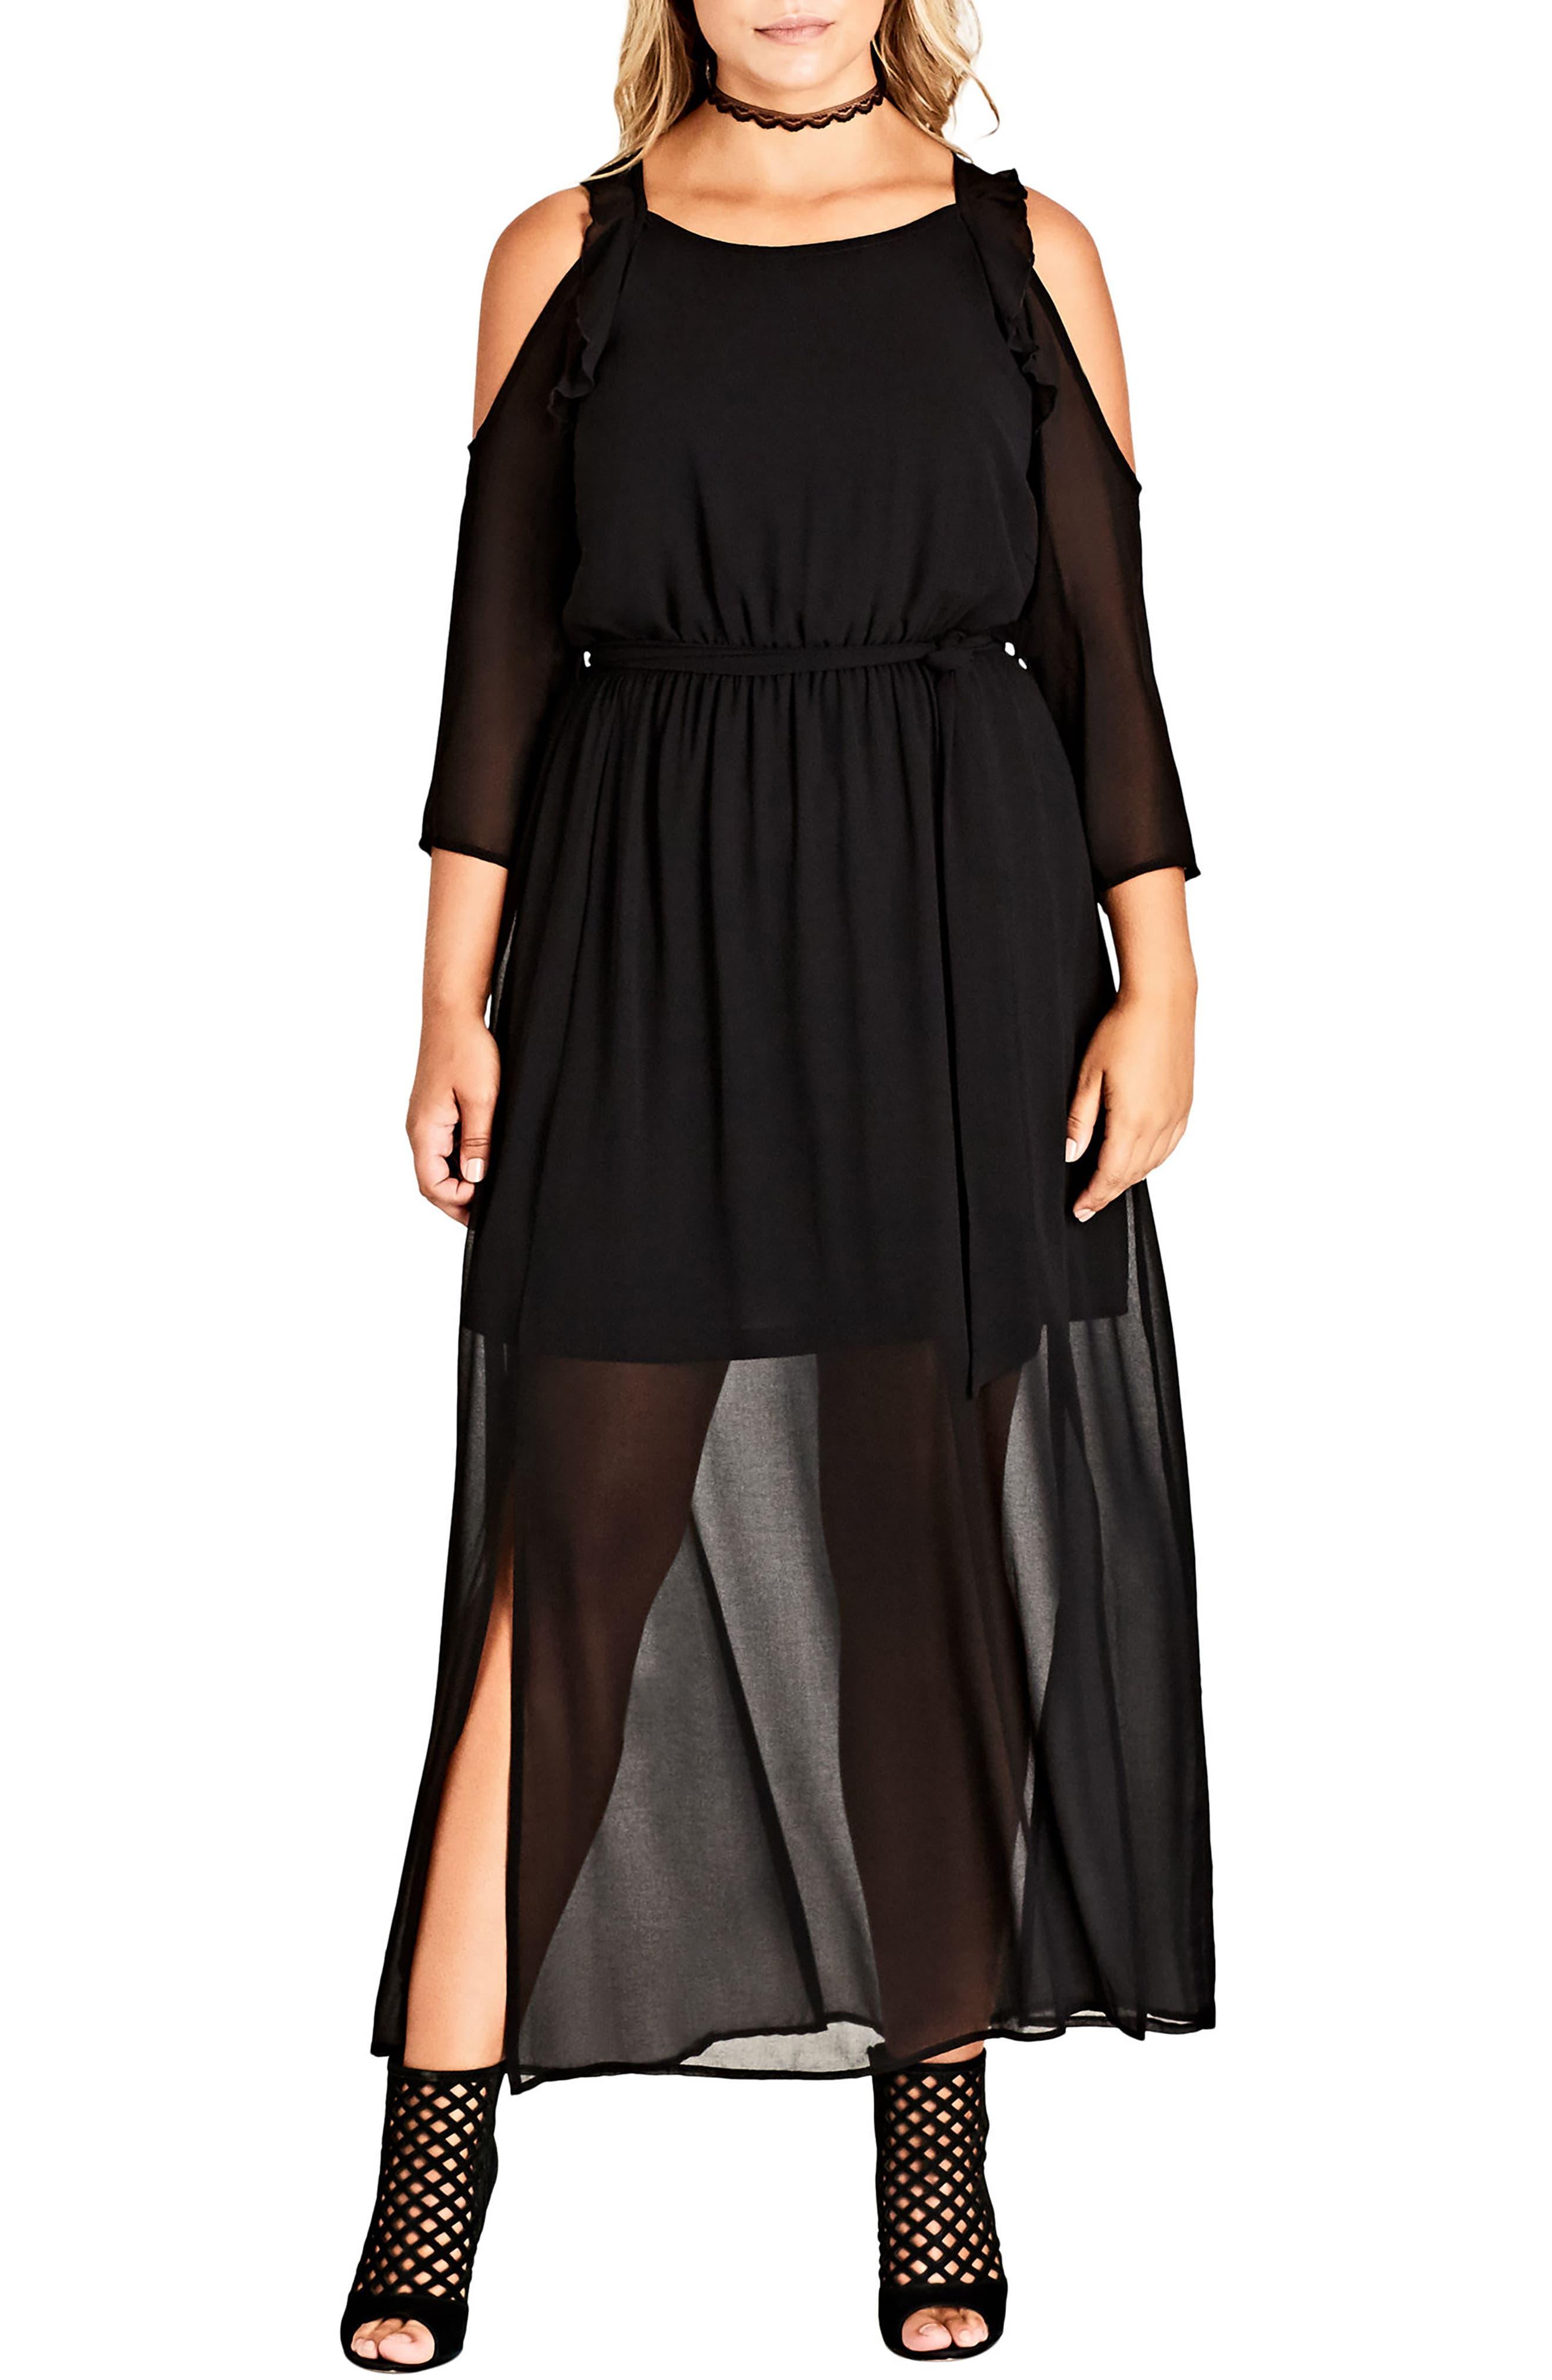 Alternate Image 1 Selected - City Chic Cold Shoulder Maxi Dress (Plus Size)